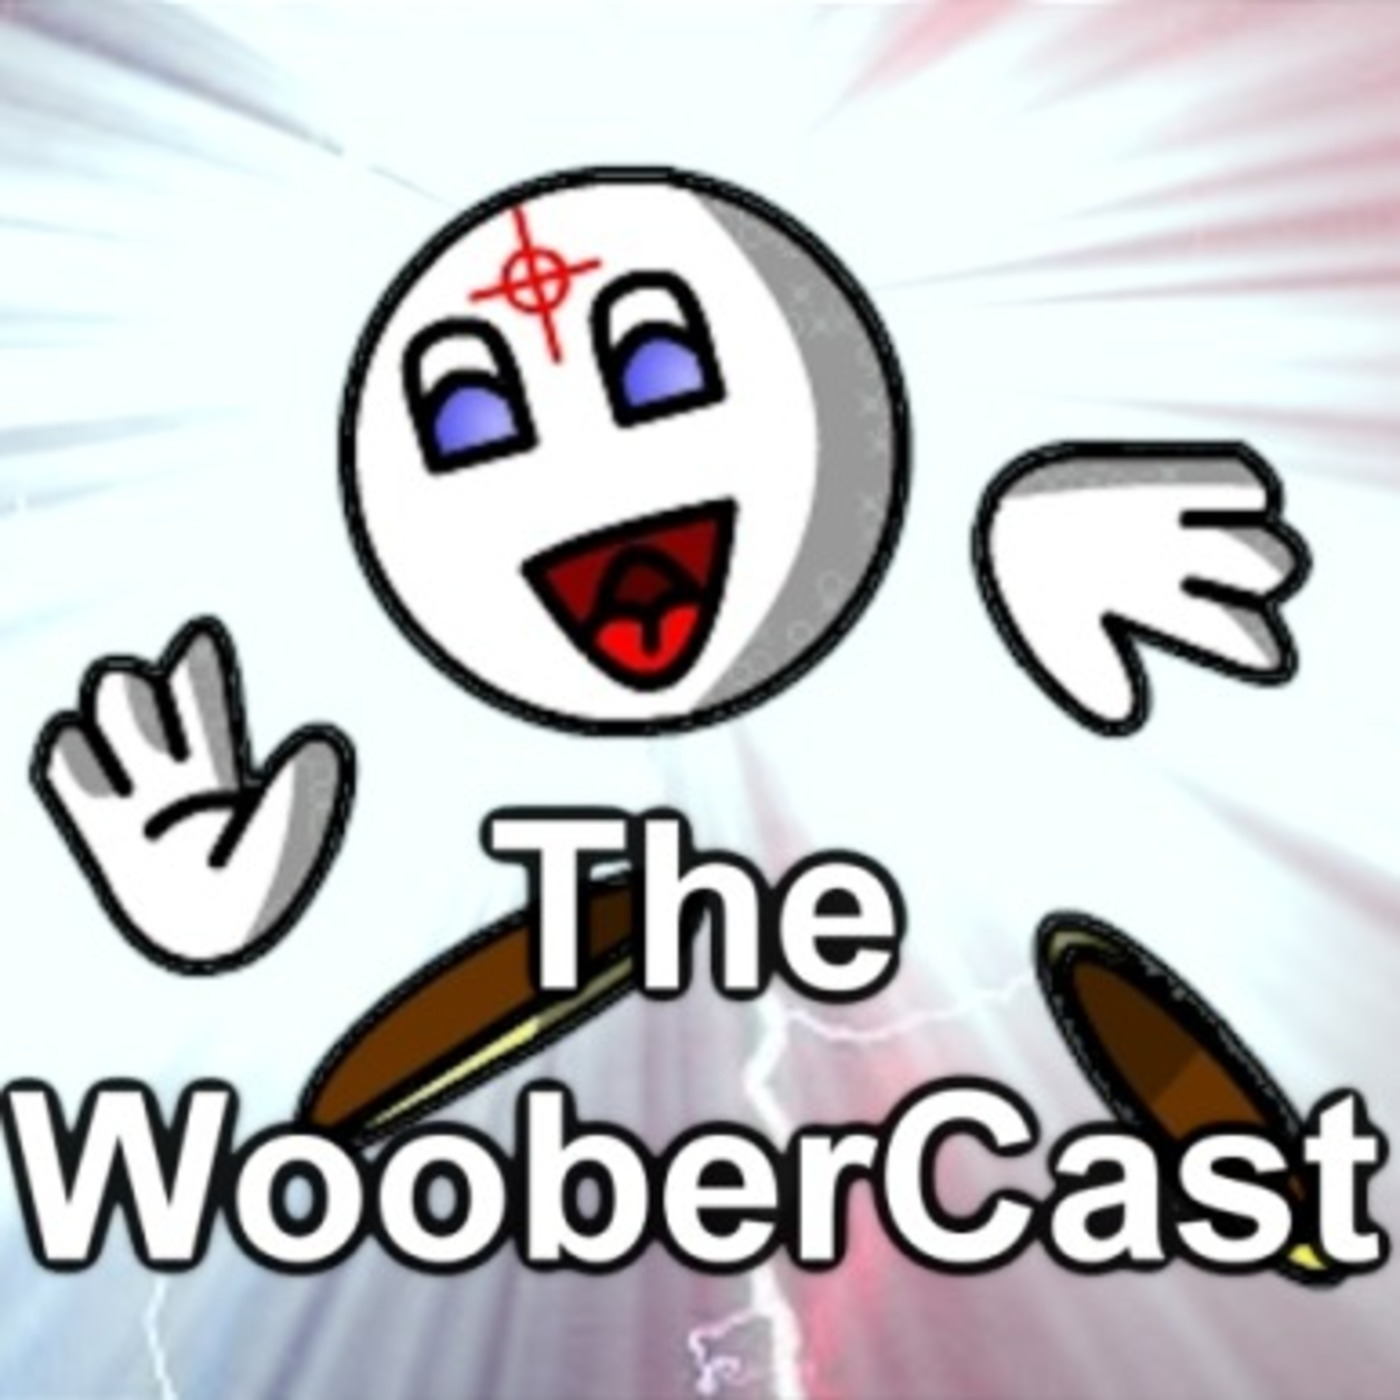 WooberCast